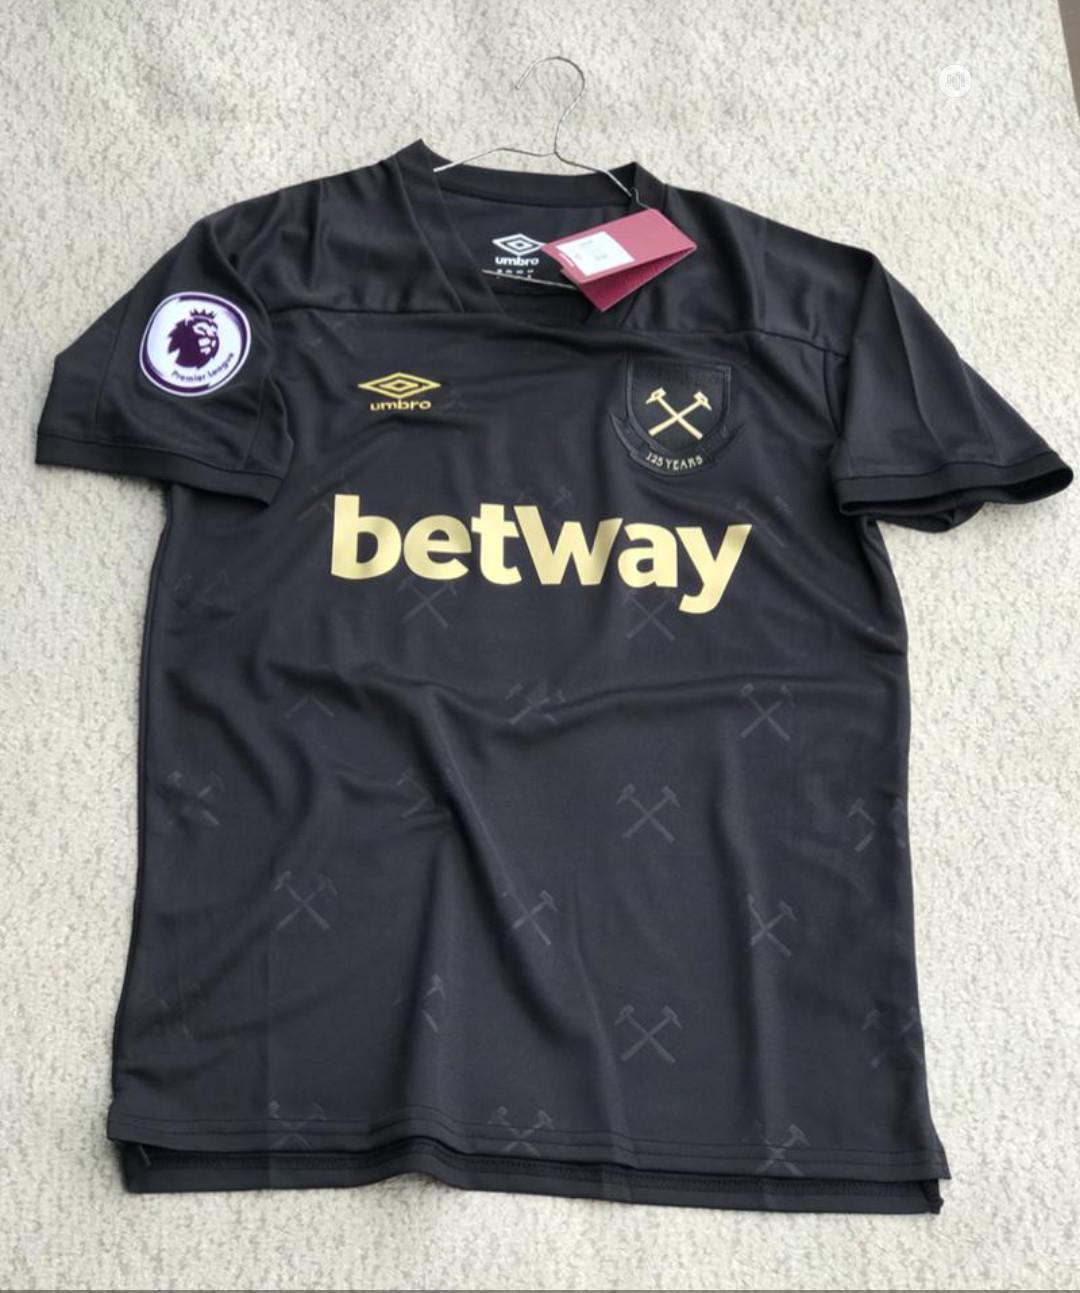 Westham United FC 2020/21 Season Third Jersey